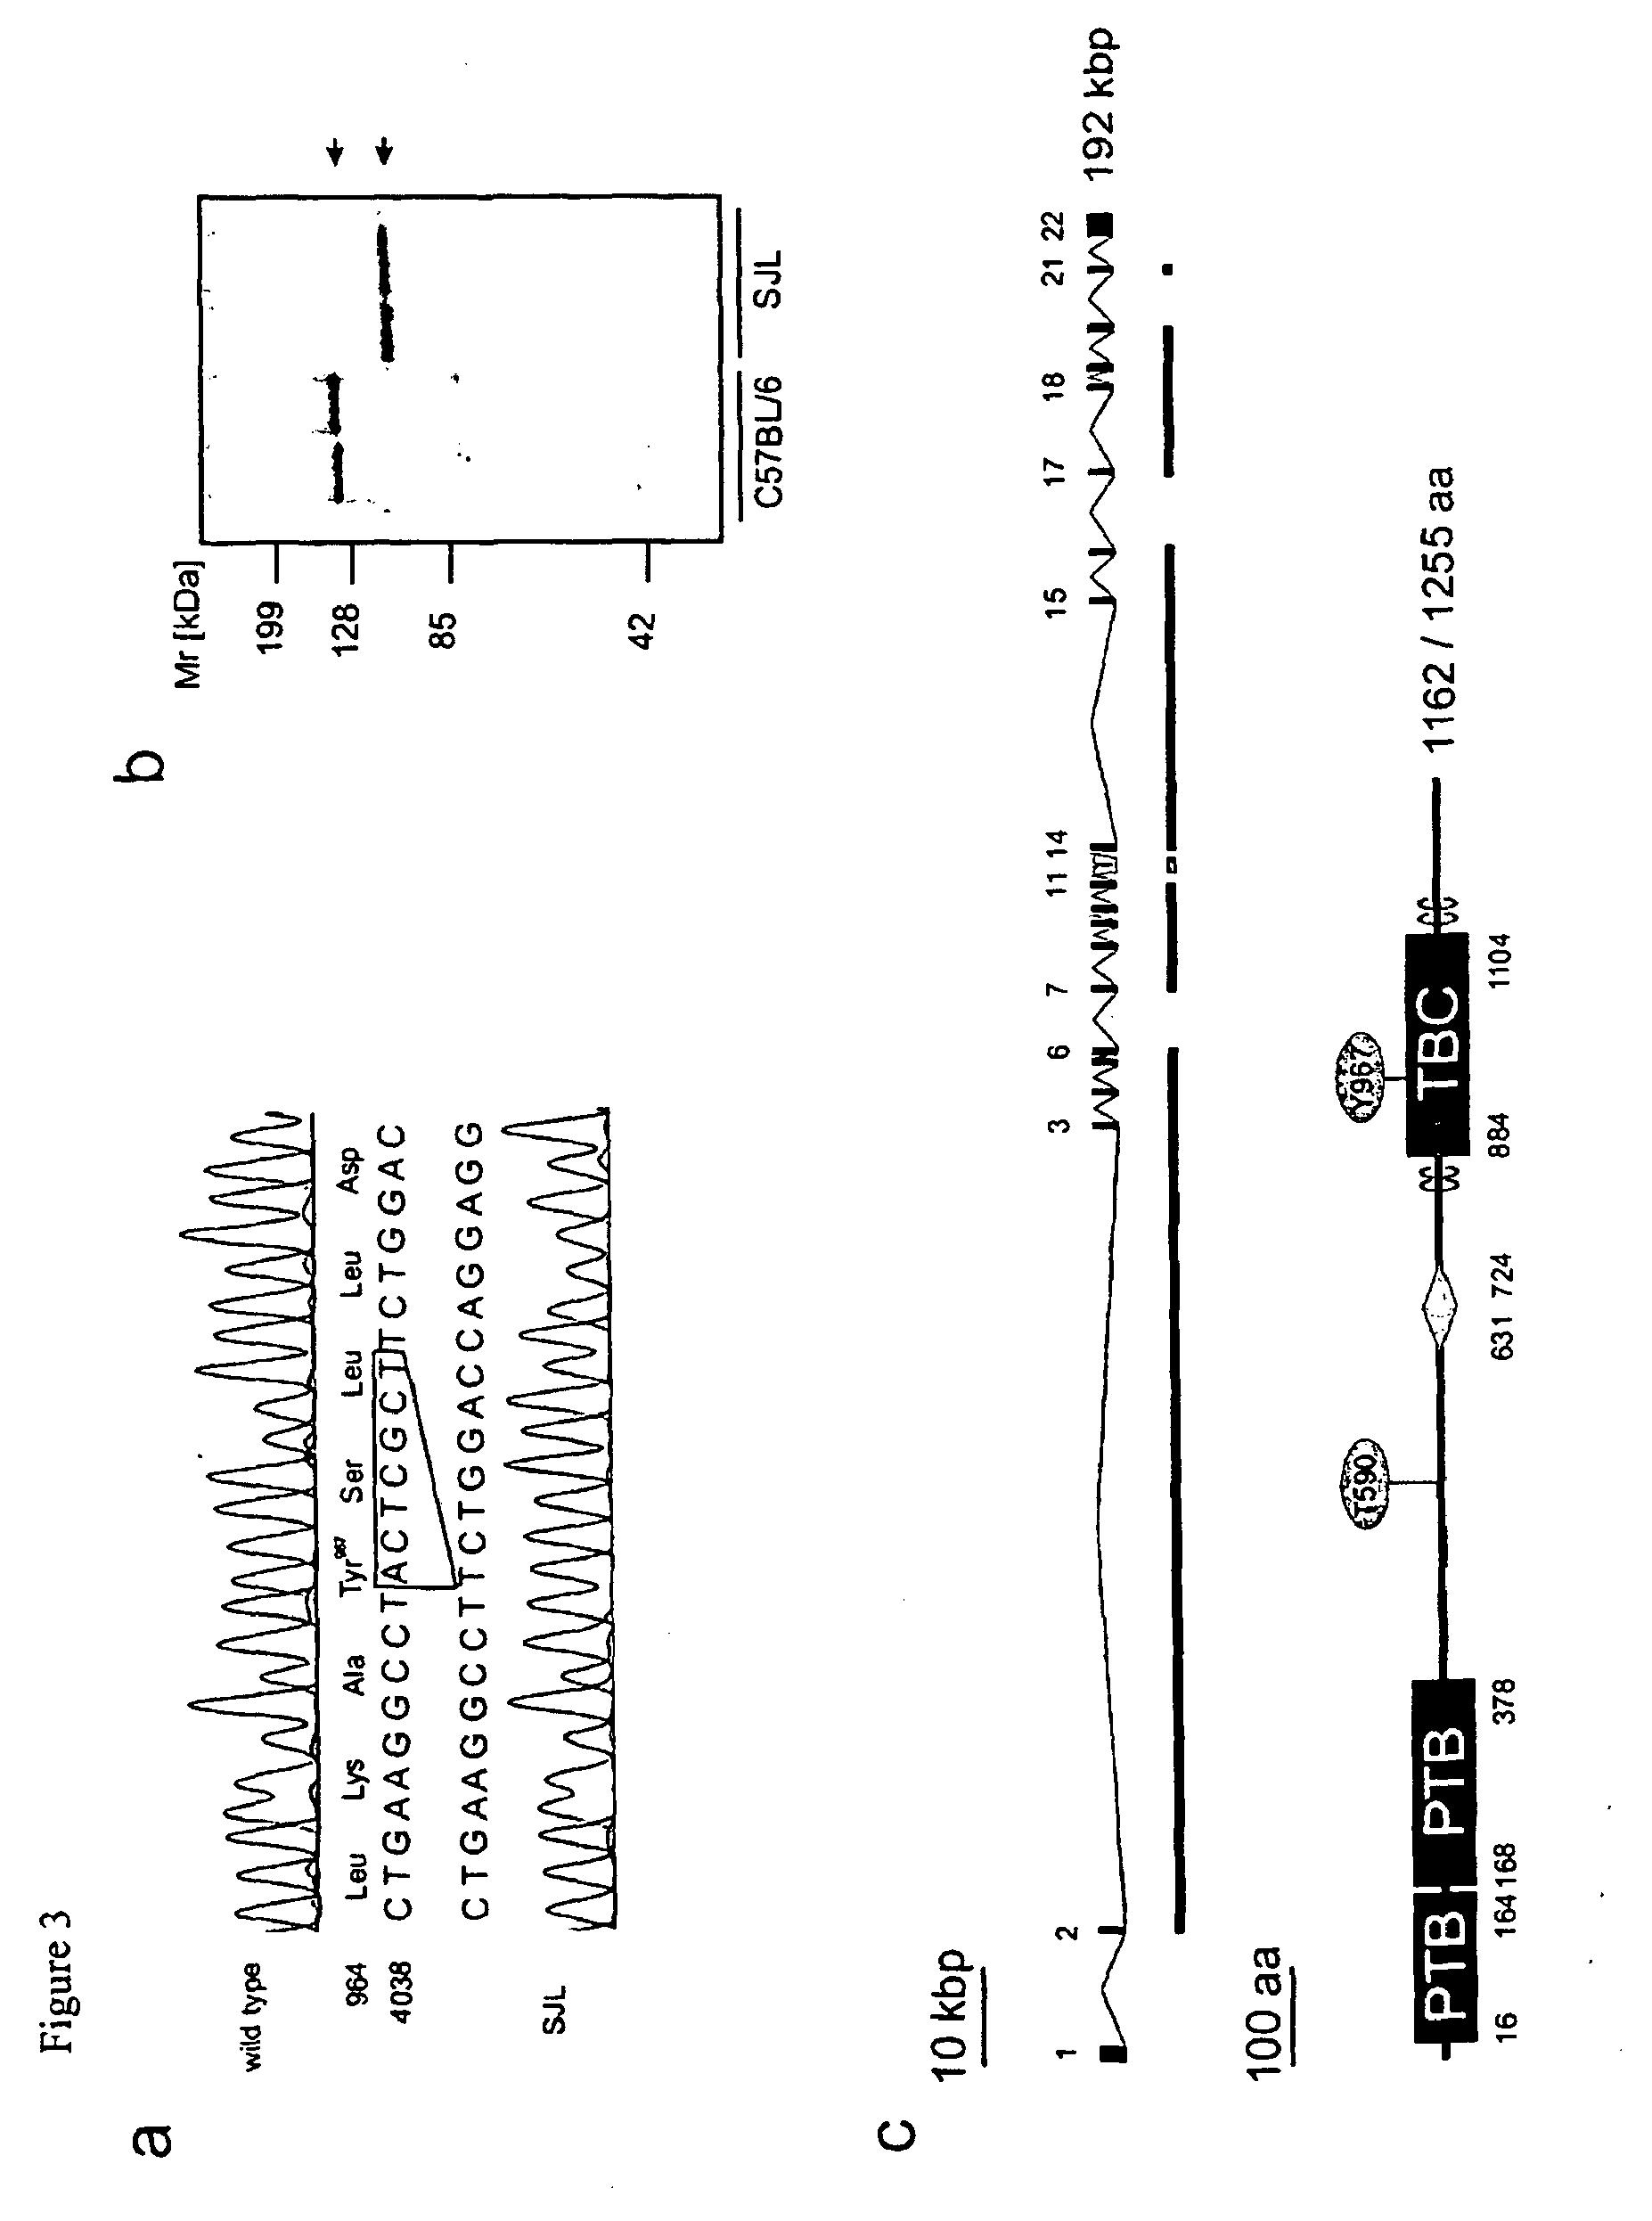 tbc1d1 diabetes mellitus